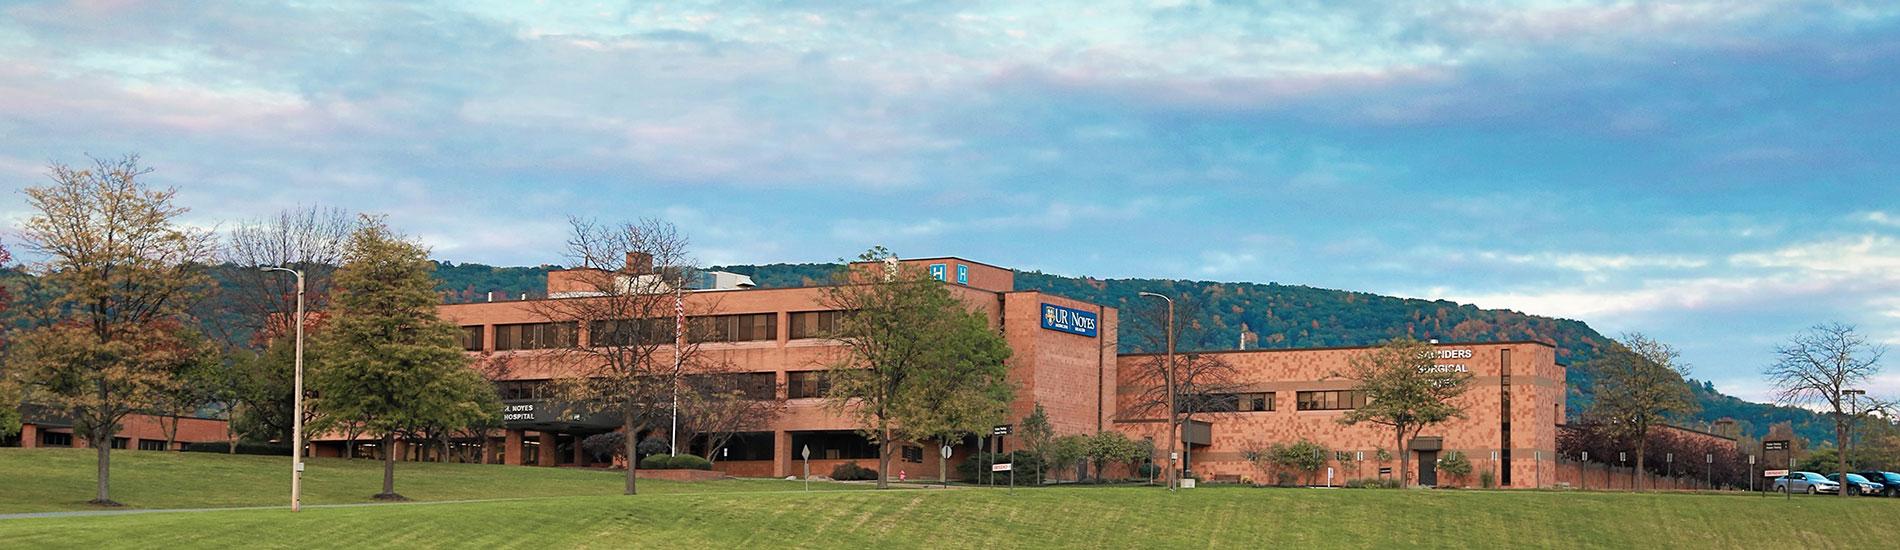 Noyes Health - University of Rochester Medical Center